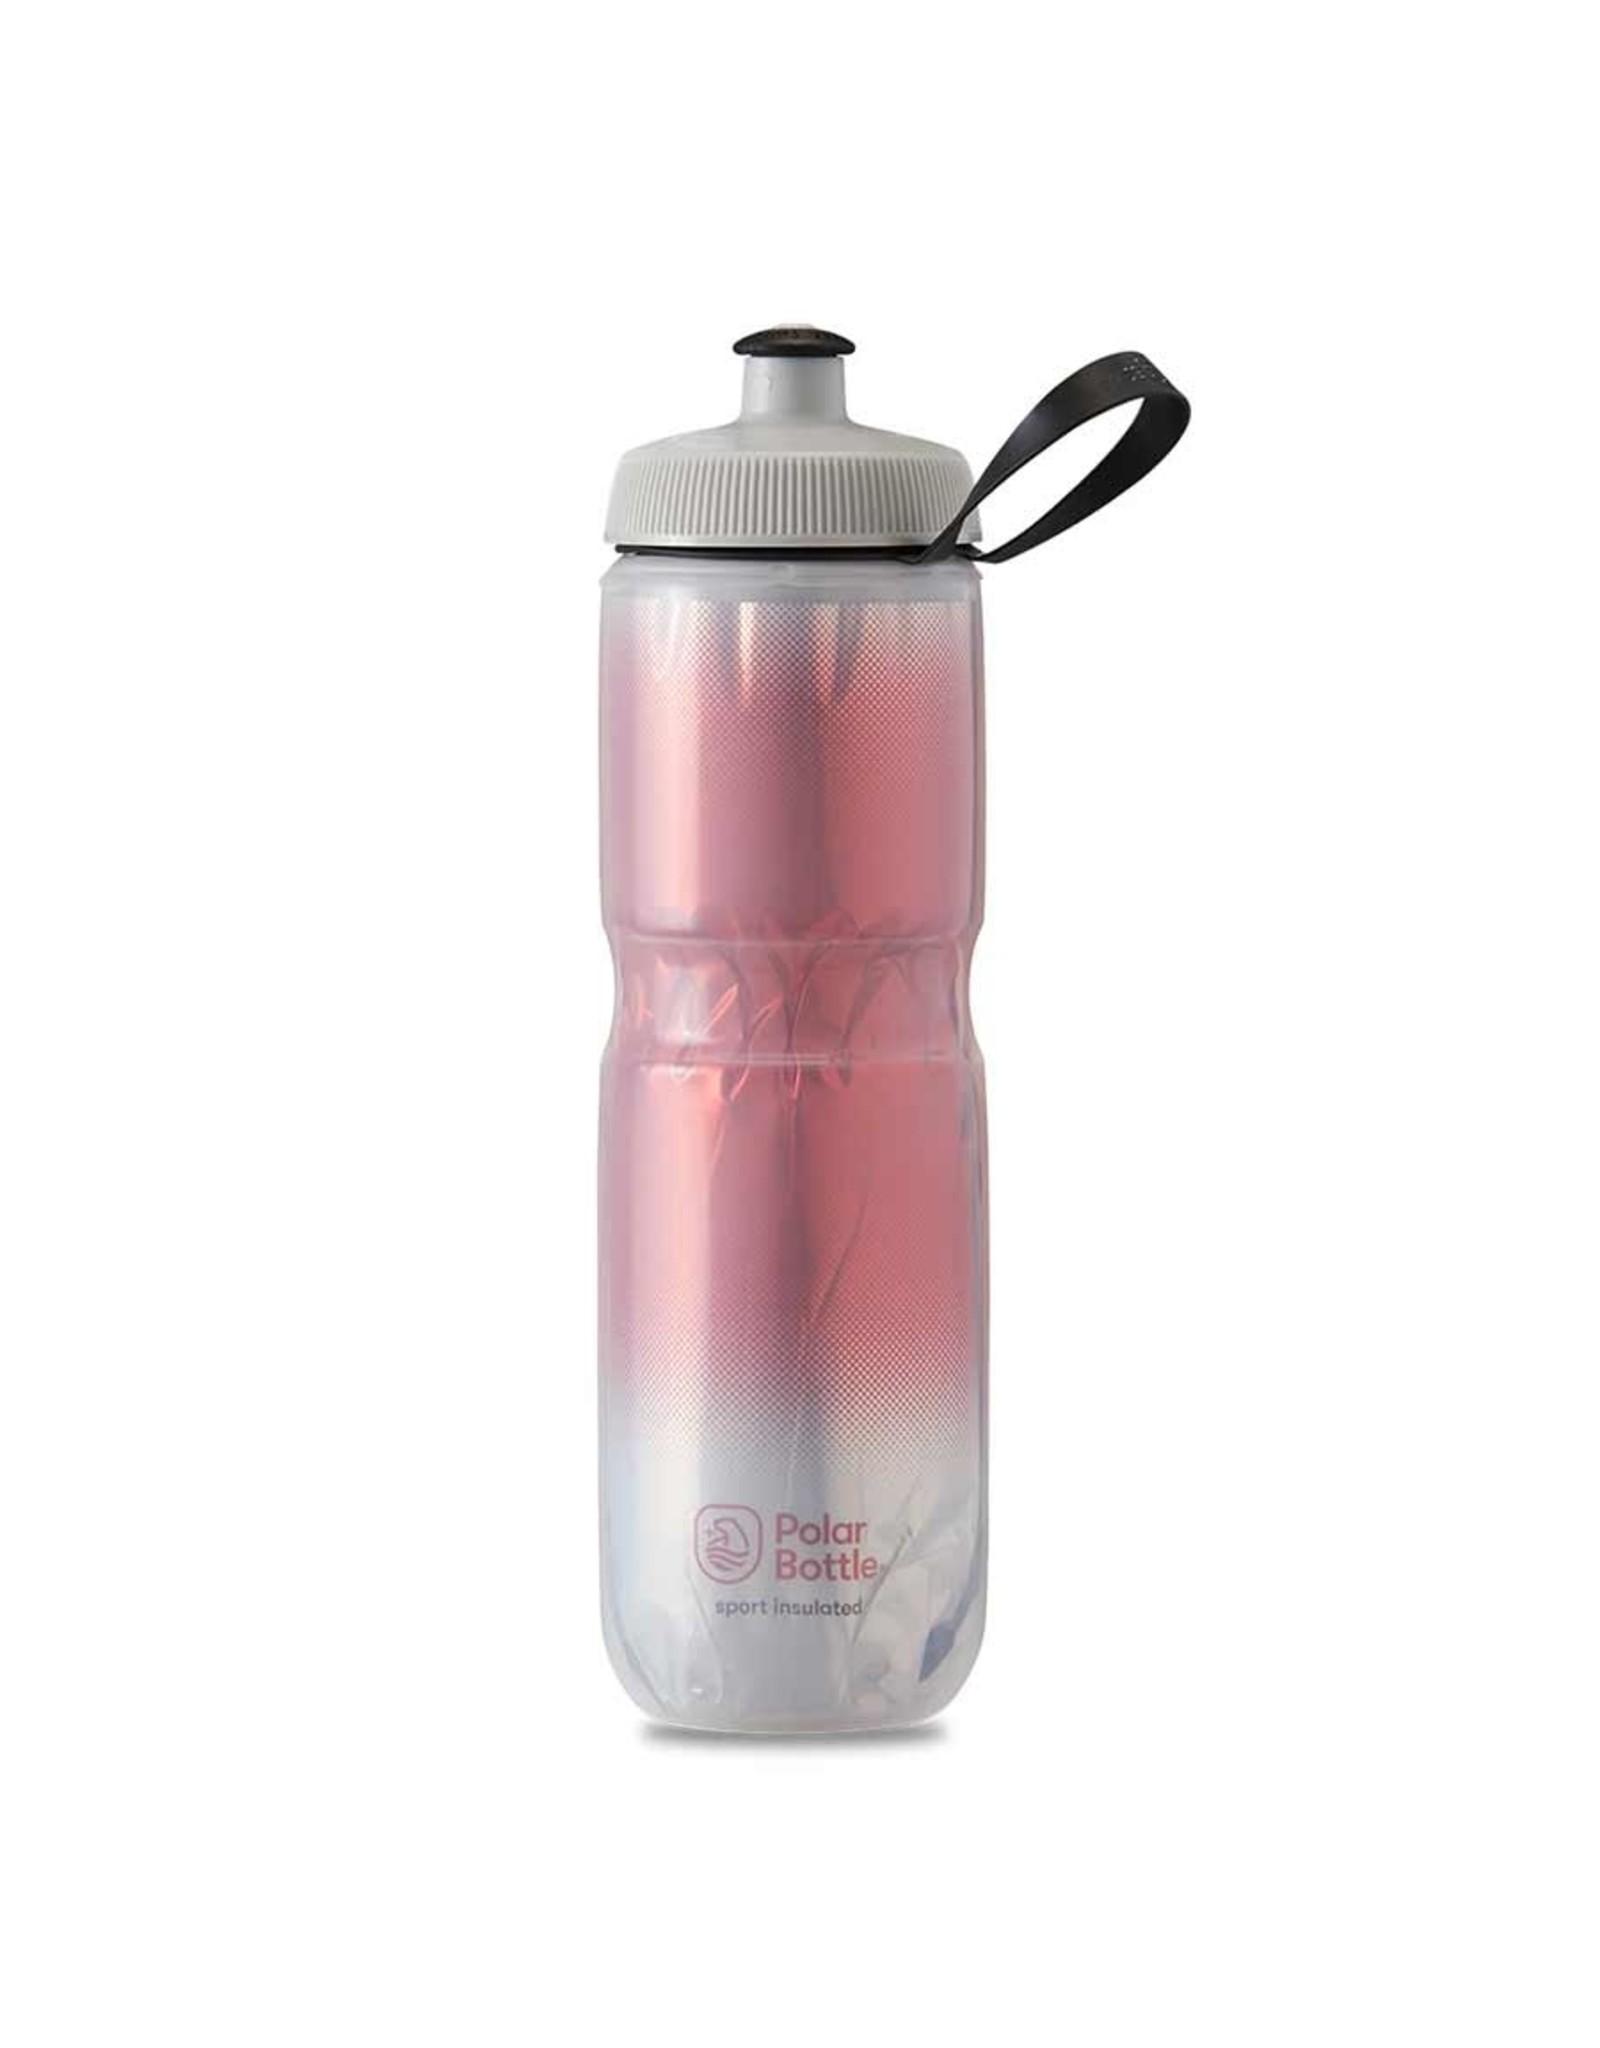 Polar Bottle Polar - Sport Insulated 24oz, Water Bottle, 710ml / 24oz, Red/Silver